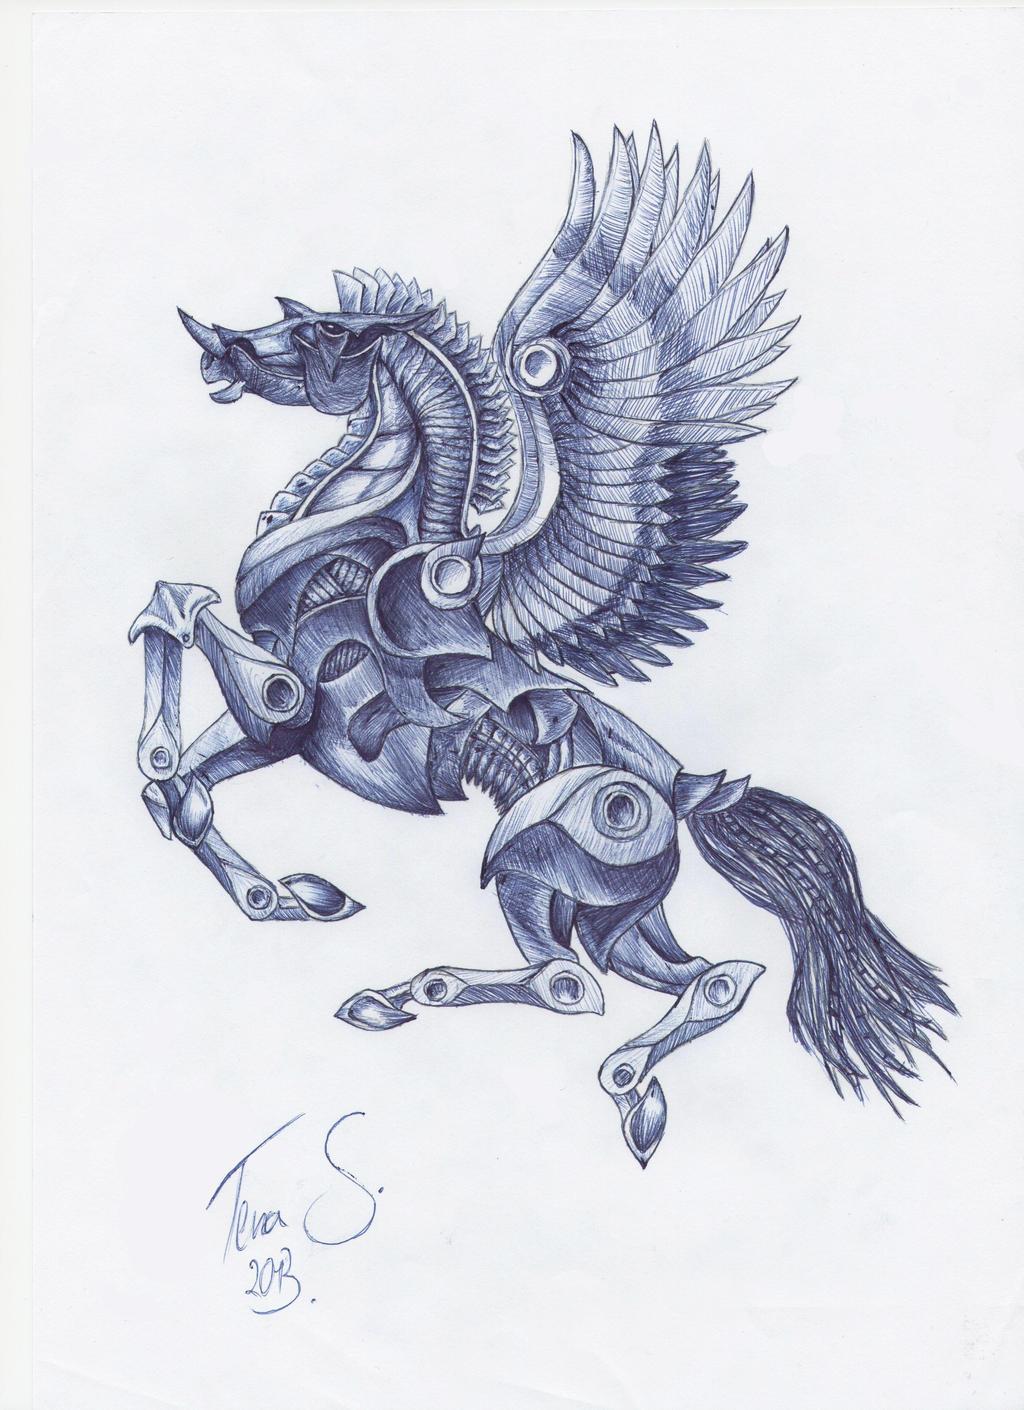 Uncategorized Drawings Of Pegasus pegasus drawing by dotz art on deviantart art